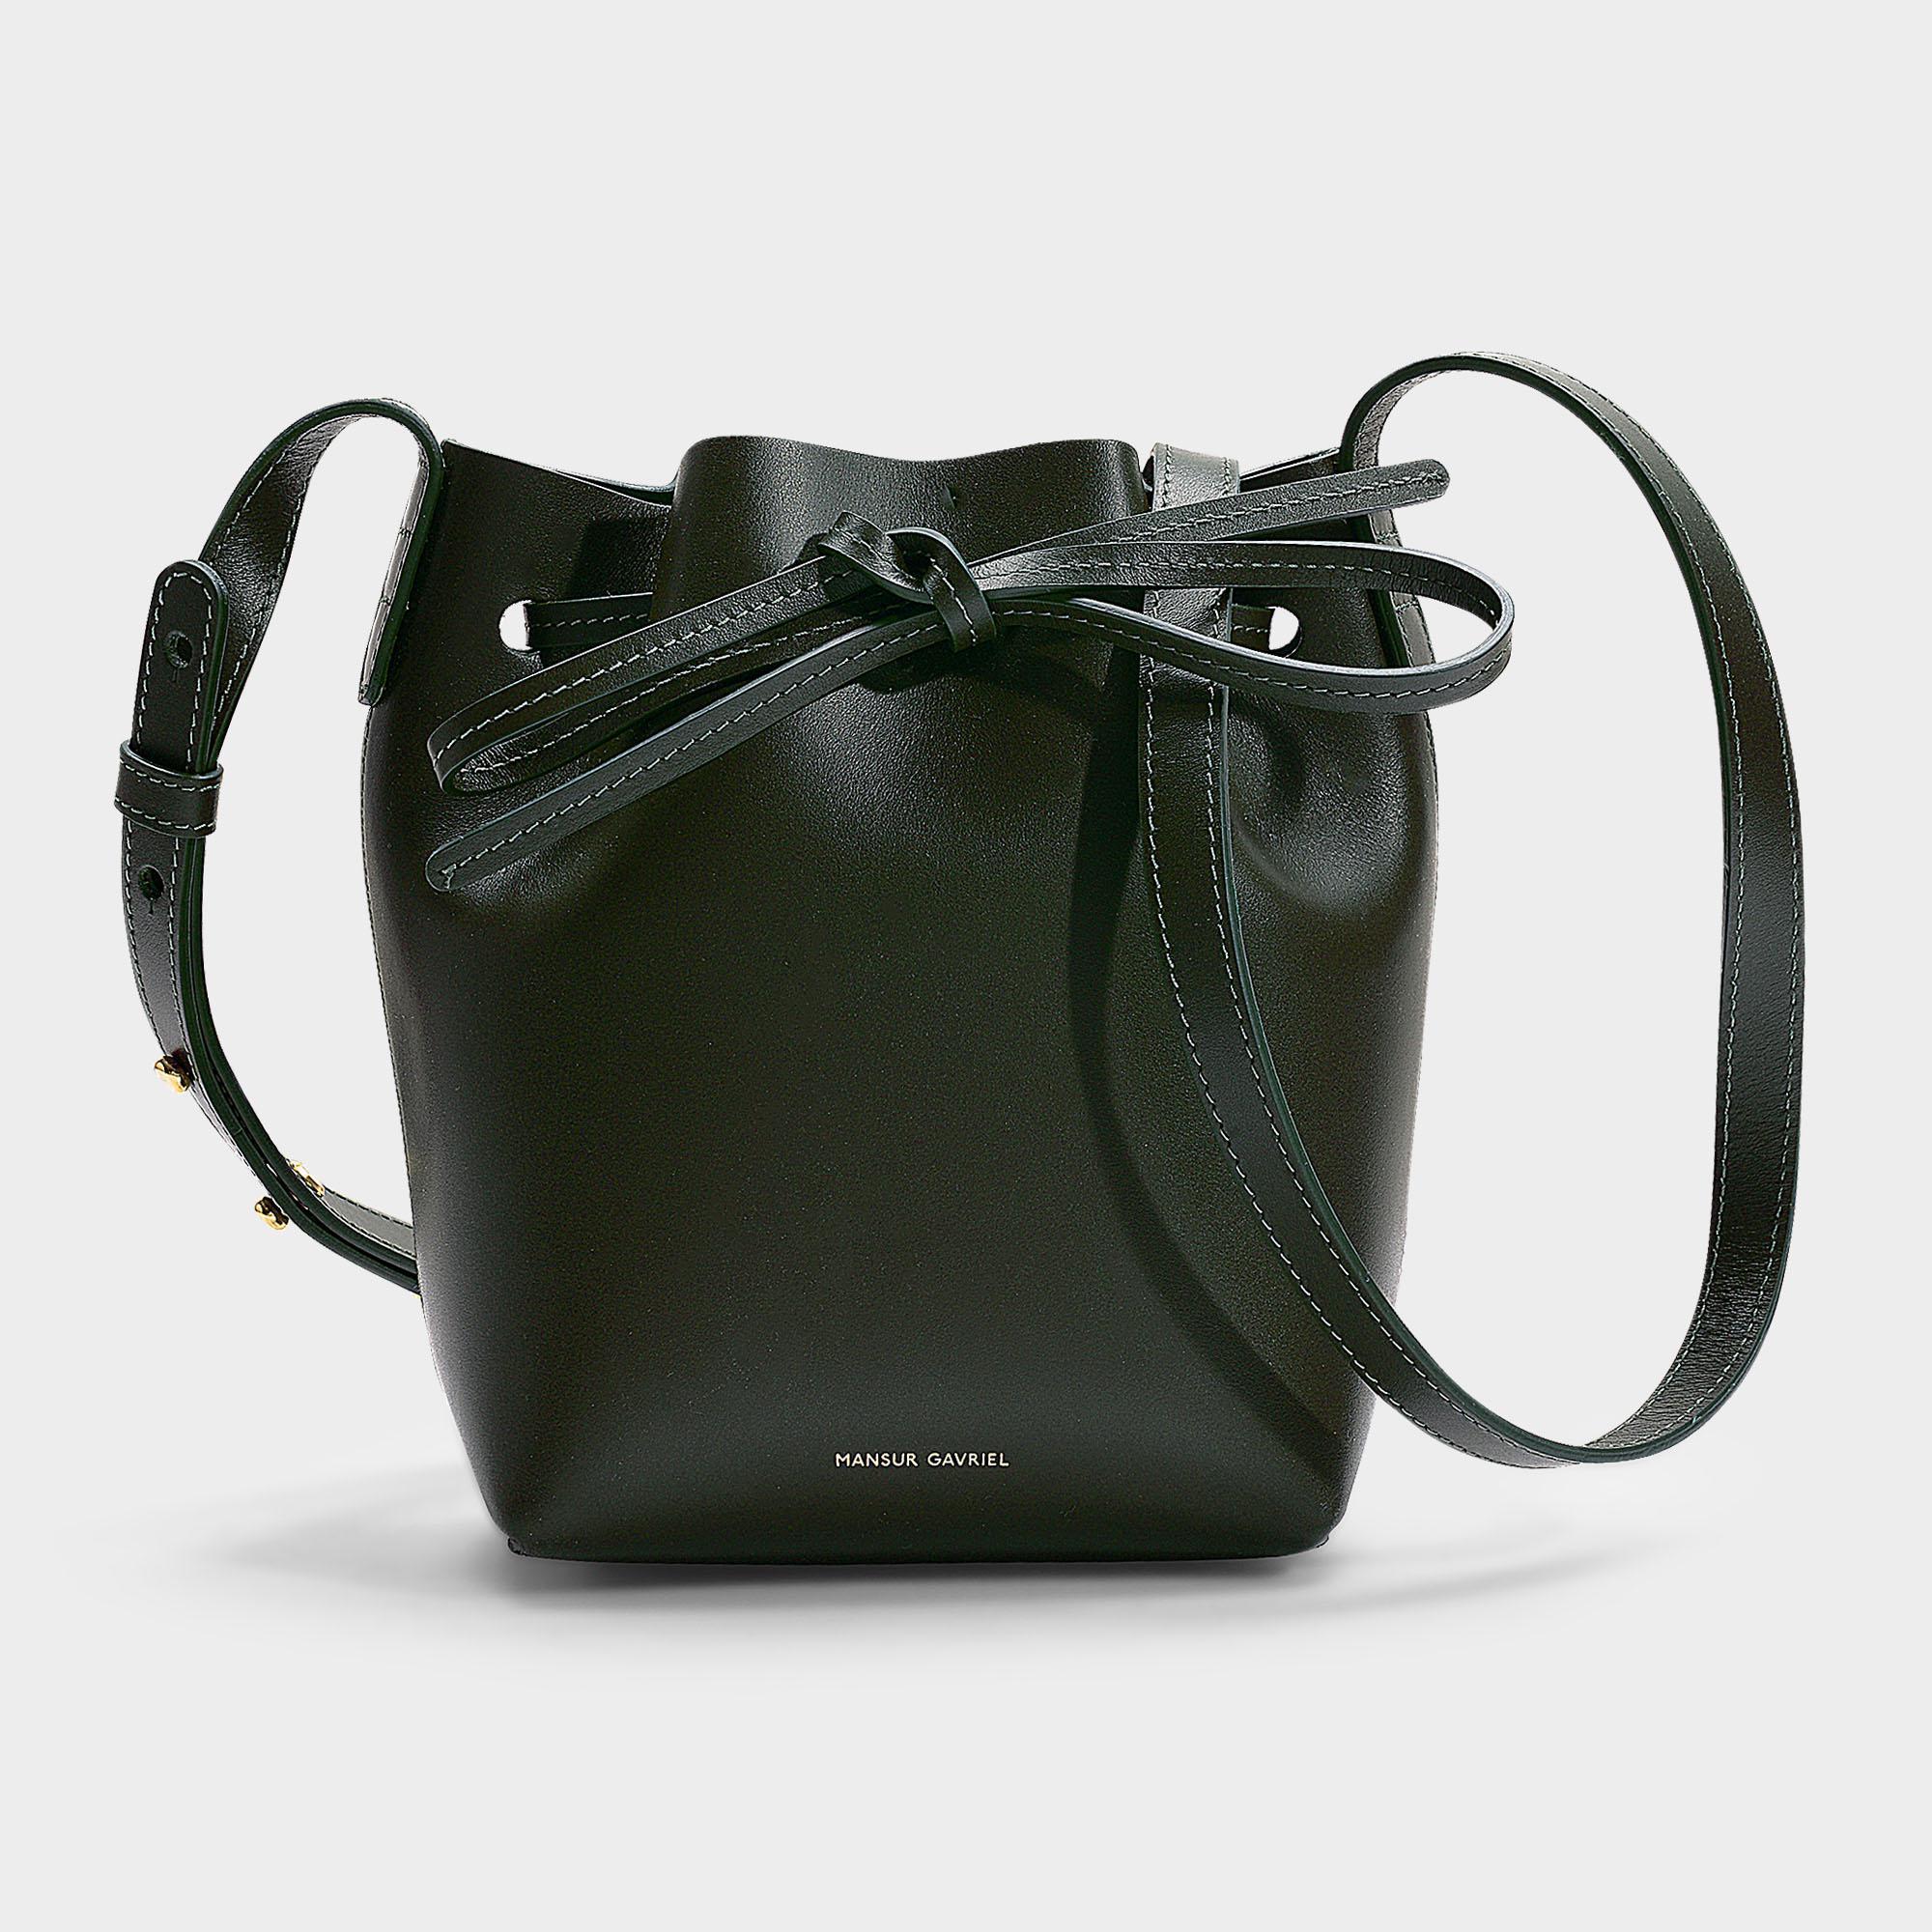 5041b4af8154 Mansur Gavriel - Mini Mini Bucket Bag In Green Calfskin - Lyst. View  fullscreen